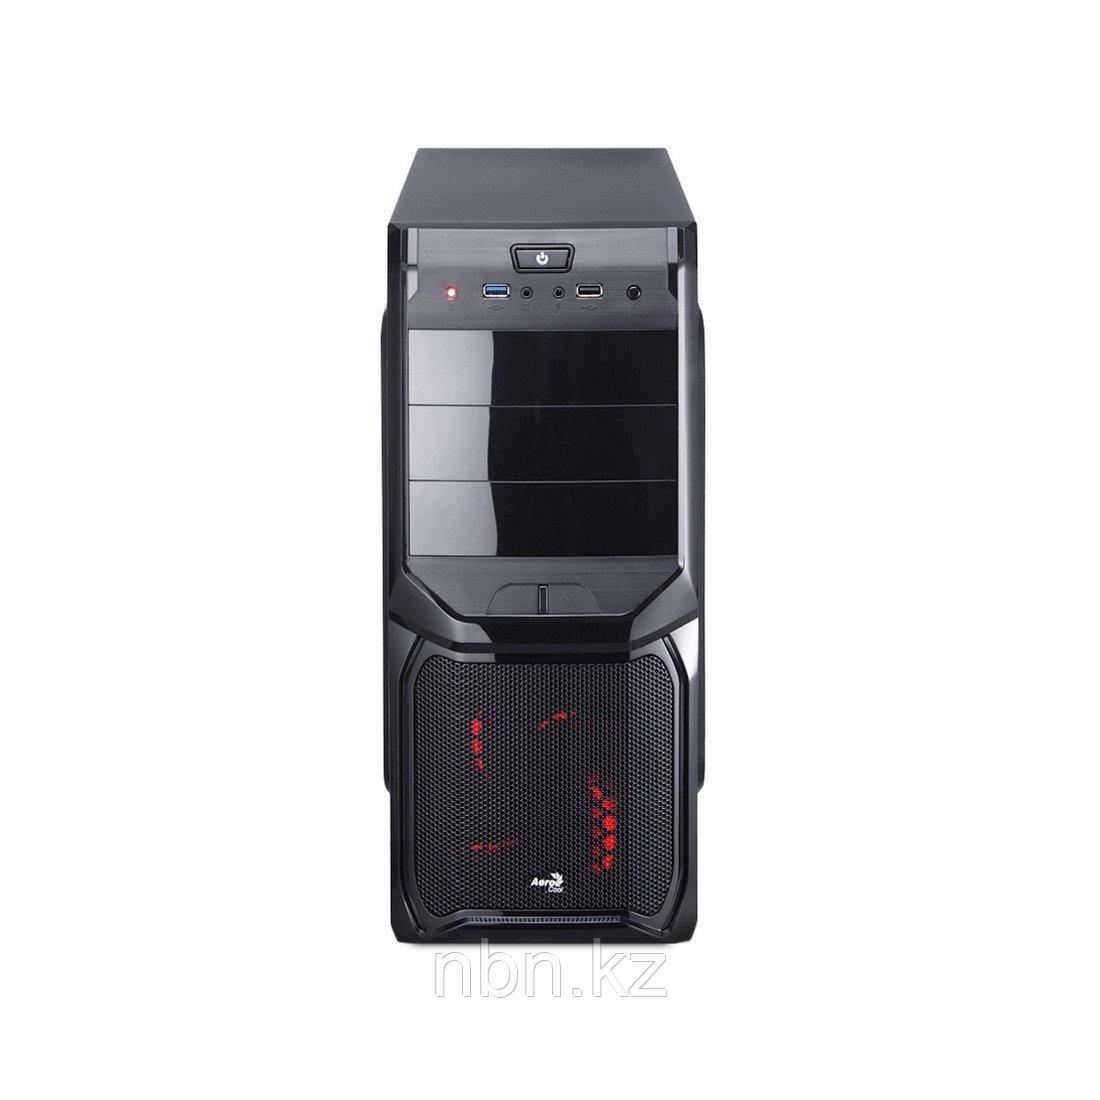 Компьютерный корпус Aerocool V3X Advance Black Edition без Б/П